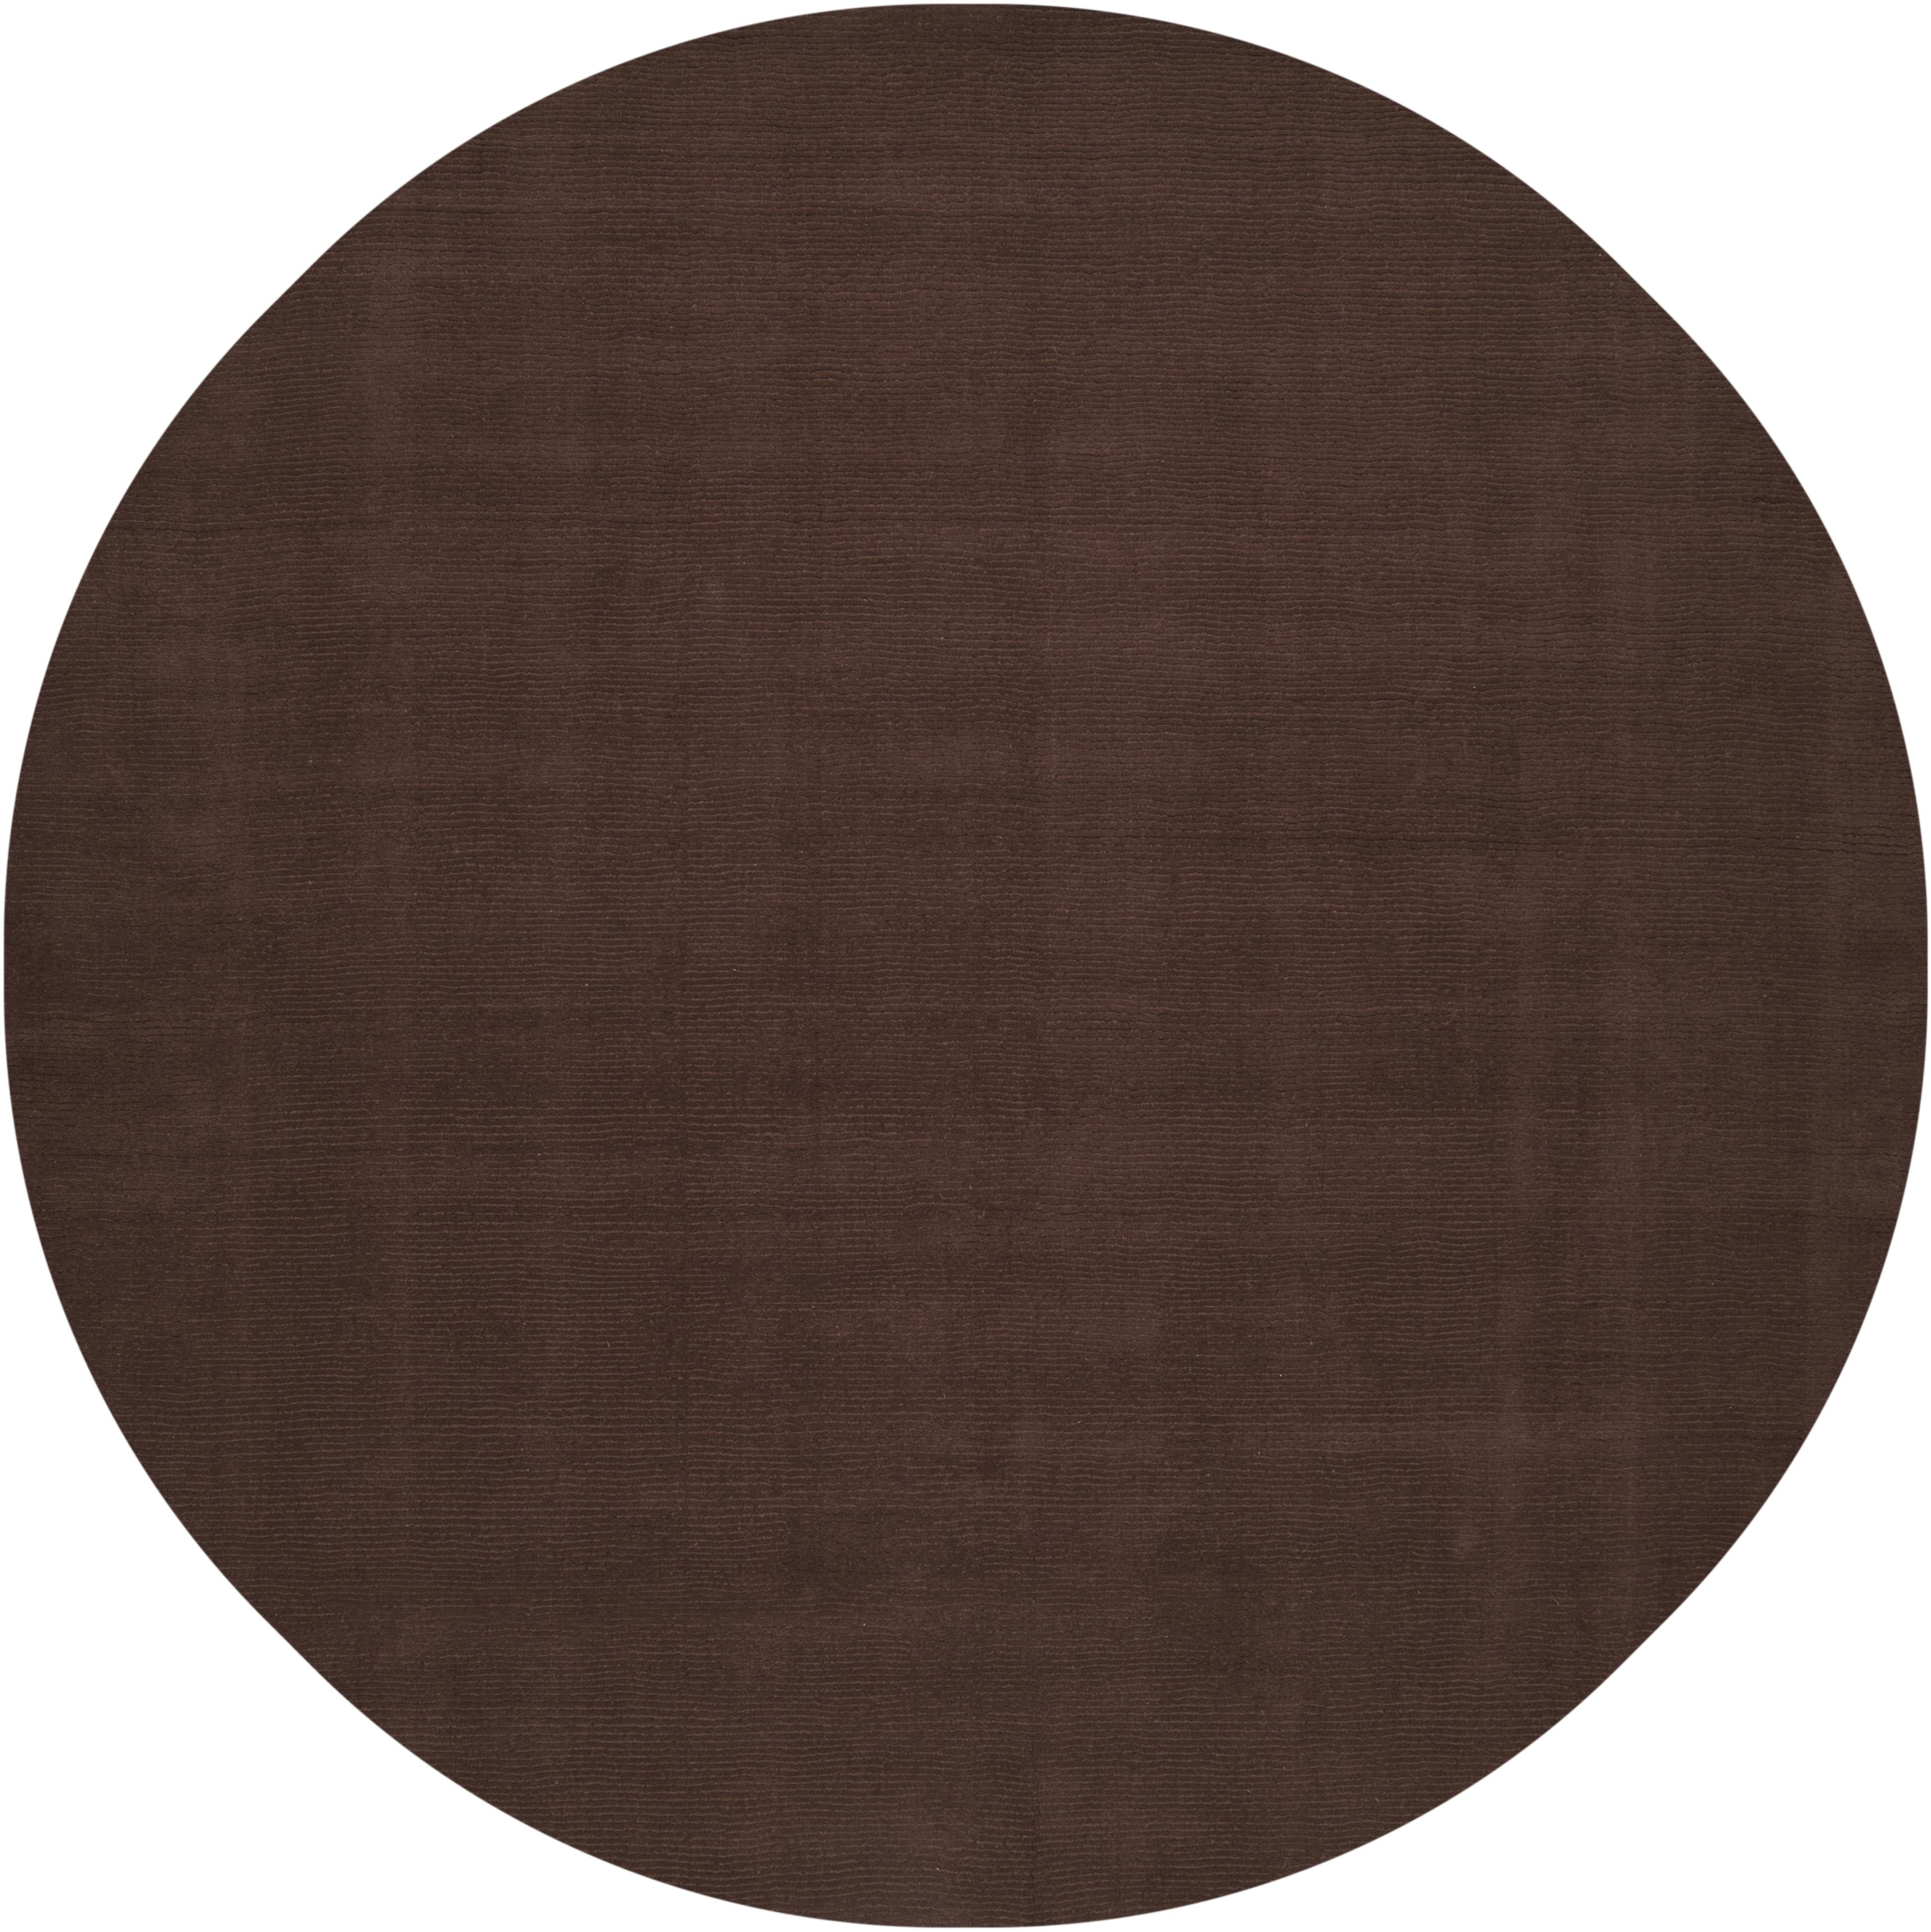 Surya Rugs Mystique 6' Round - Item Number: M334-6RD